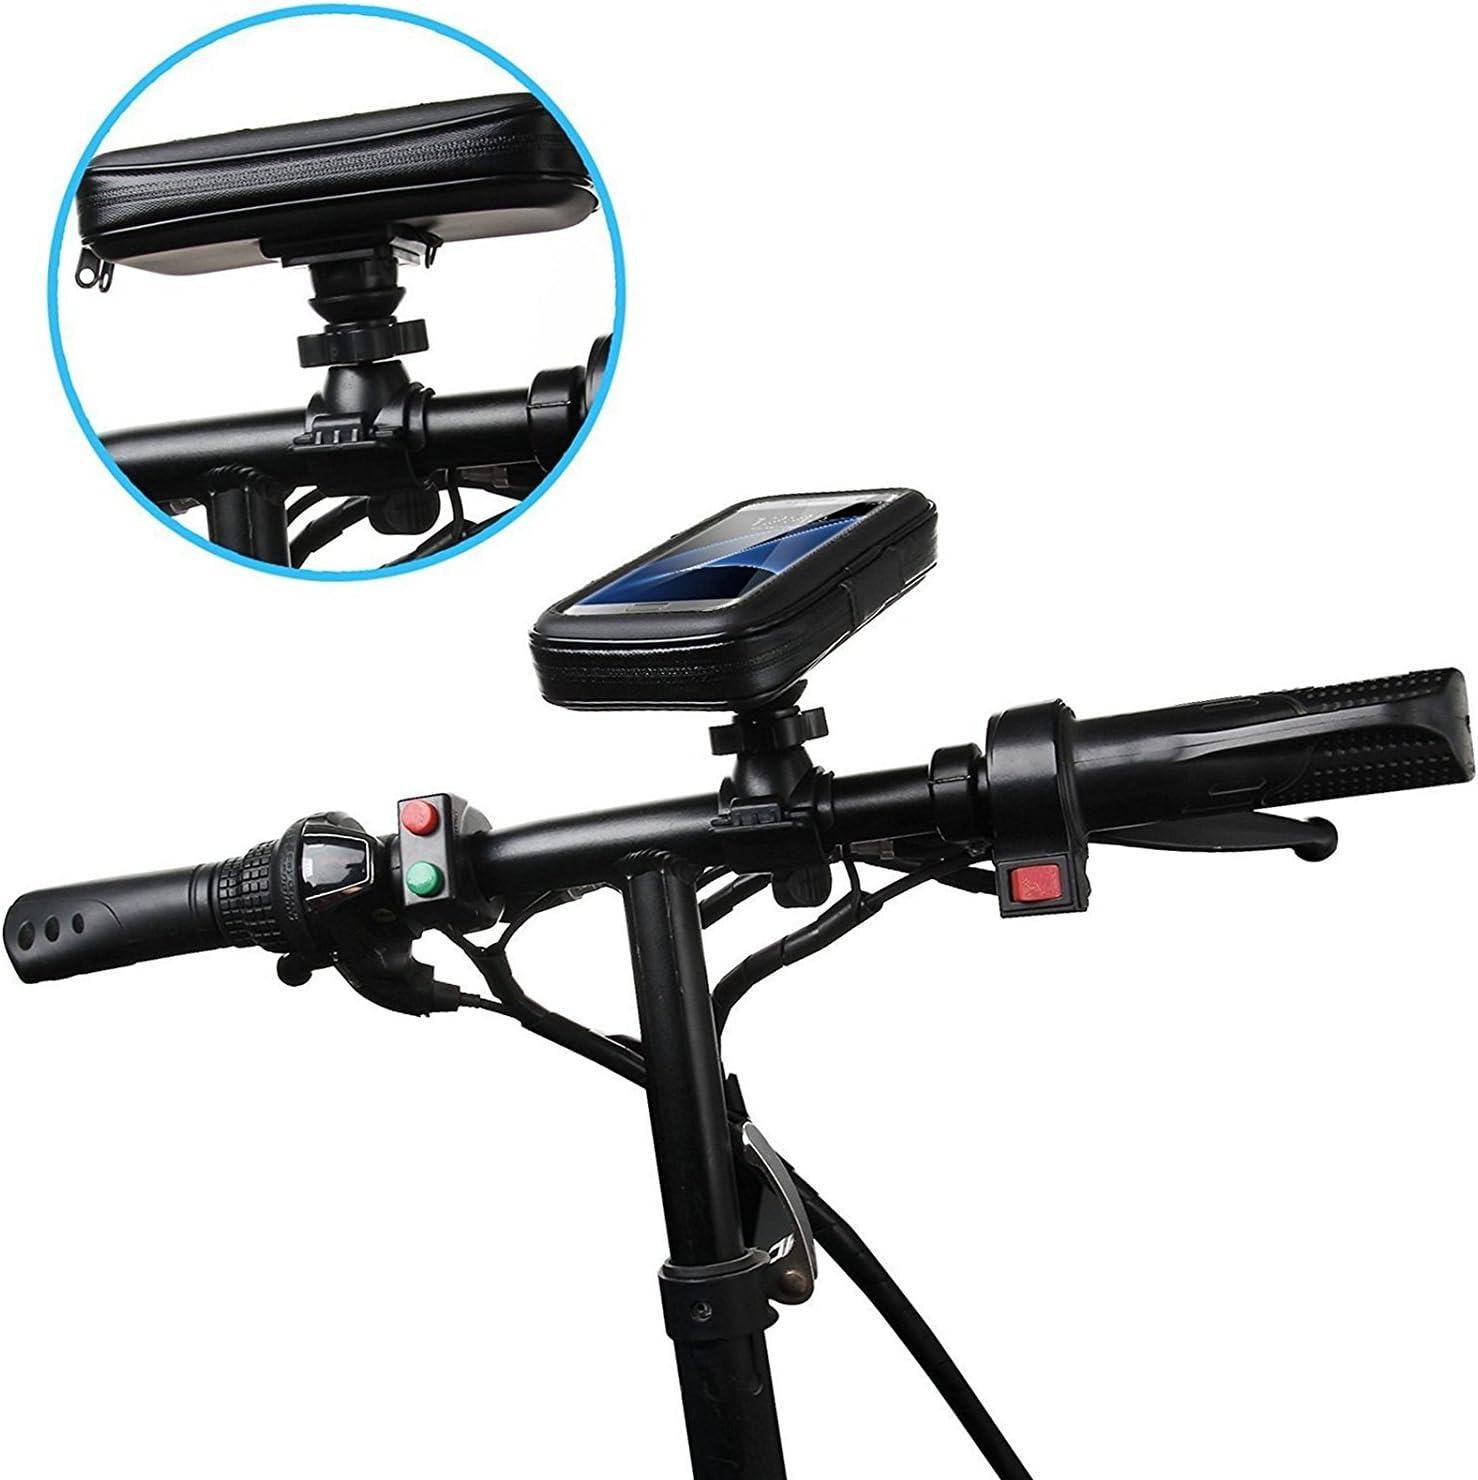 DaoRier Agua Densidad Bicicleta Moto Bike Carcasa ABS universal Soporte Bicicleta Manillar Soporte para teléfono móvil impermeable para iPhone 5 5 C 5S Samsung Galaxy ...